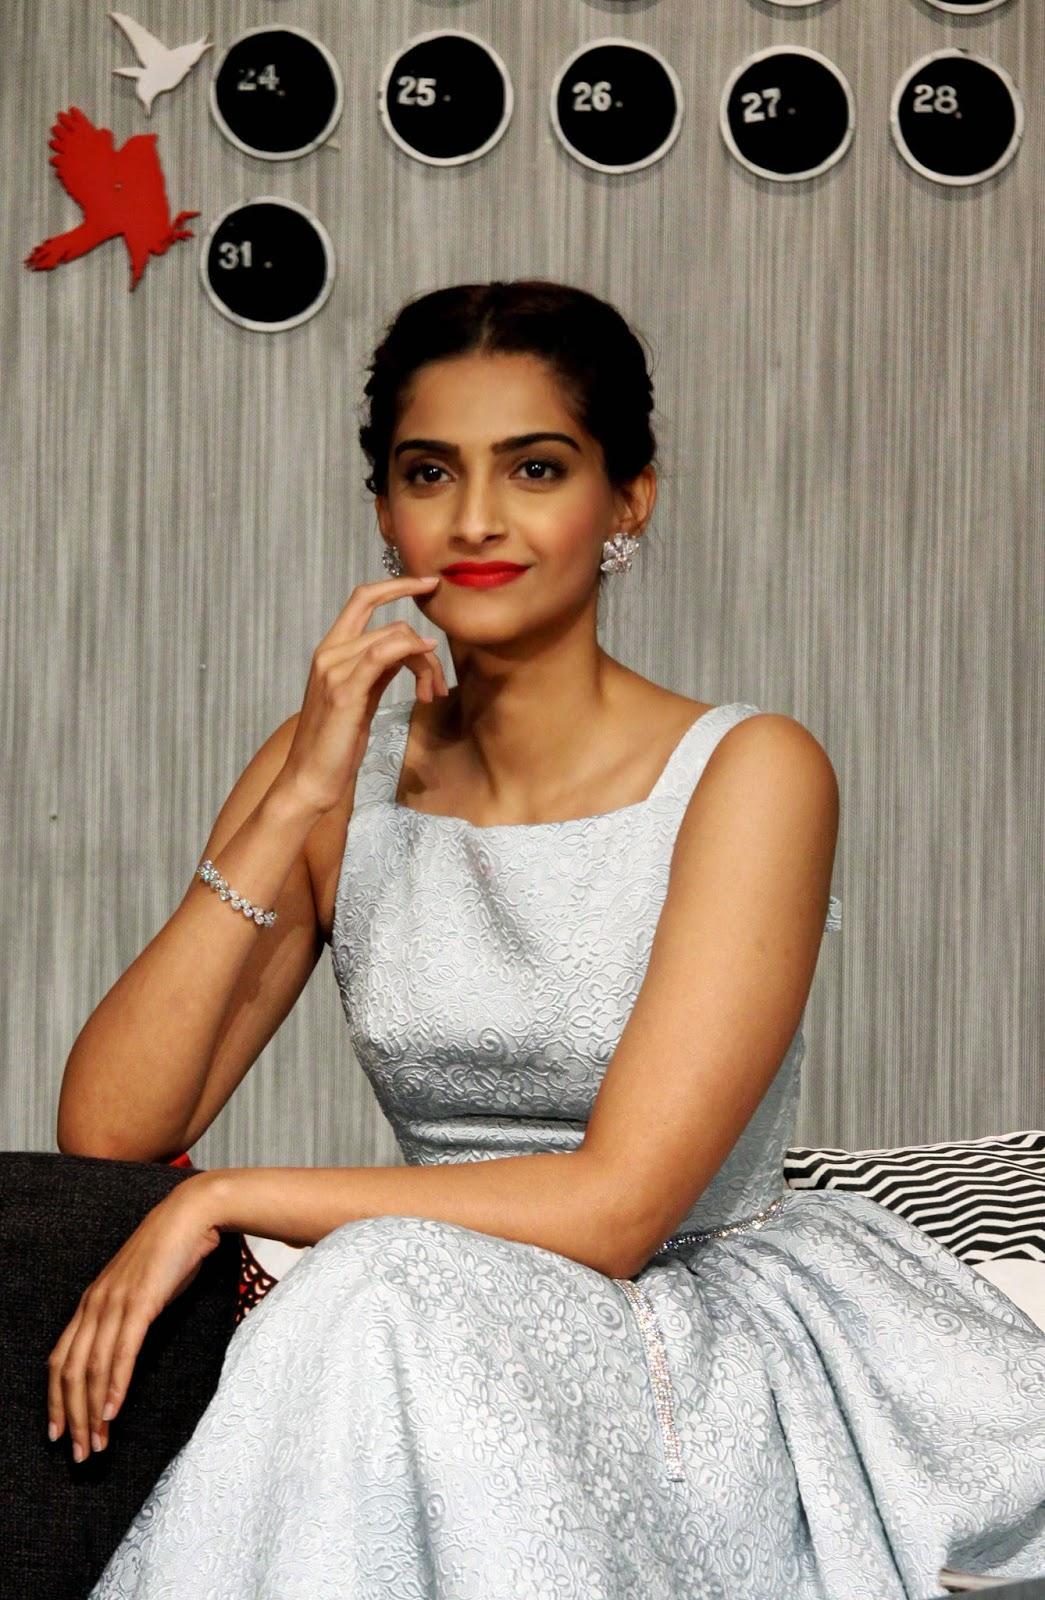 2014 movies, Actor, Actress, Ayushmann Khurrana, Bewakoofiyaan, Bollywood, Entertainment, Film, Hindi Film, Movies, Release, Showbiz, Sonam Kapoor,